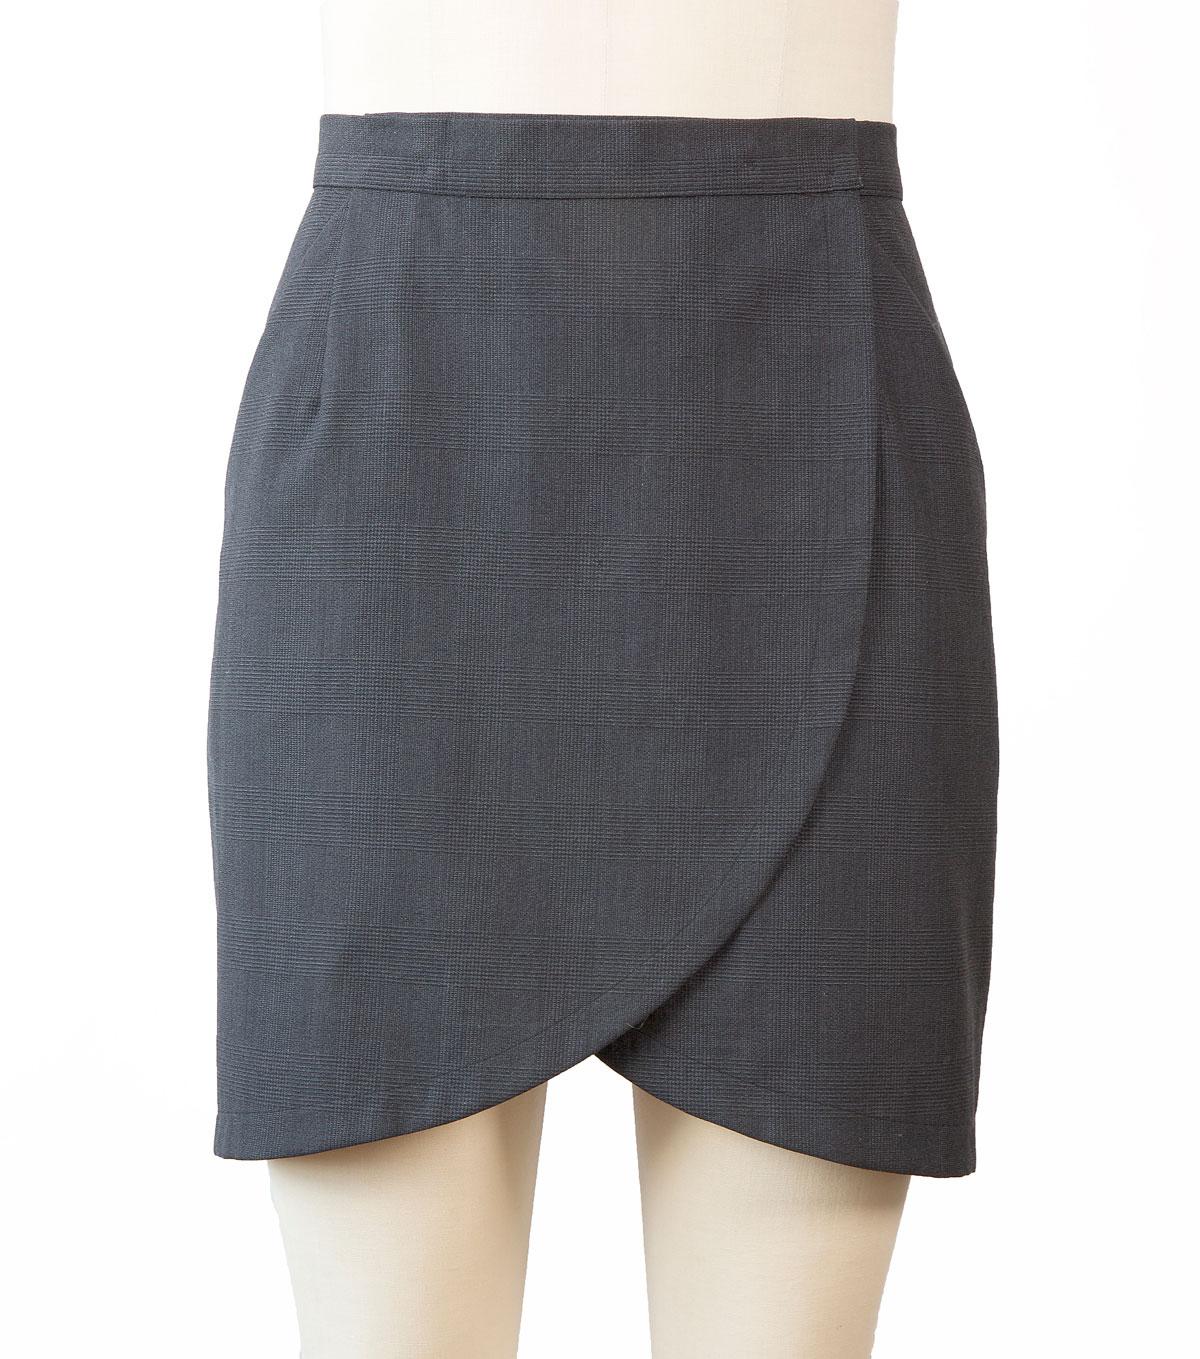 Introducing the Liesl + Co City Stroll Wrap Skirt